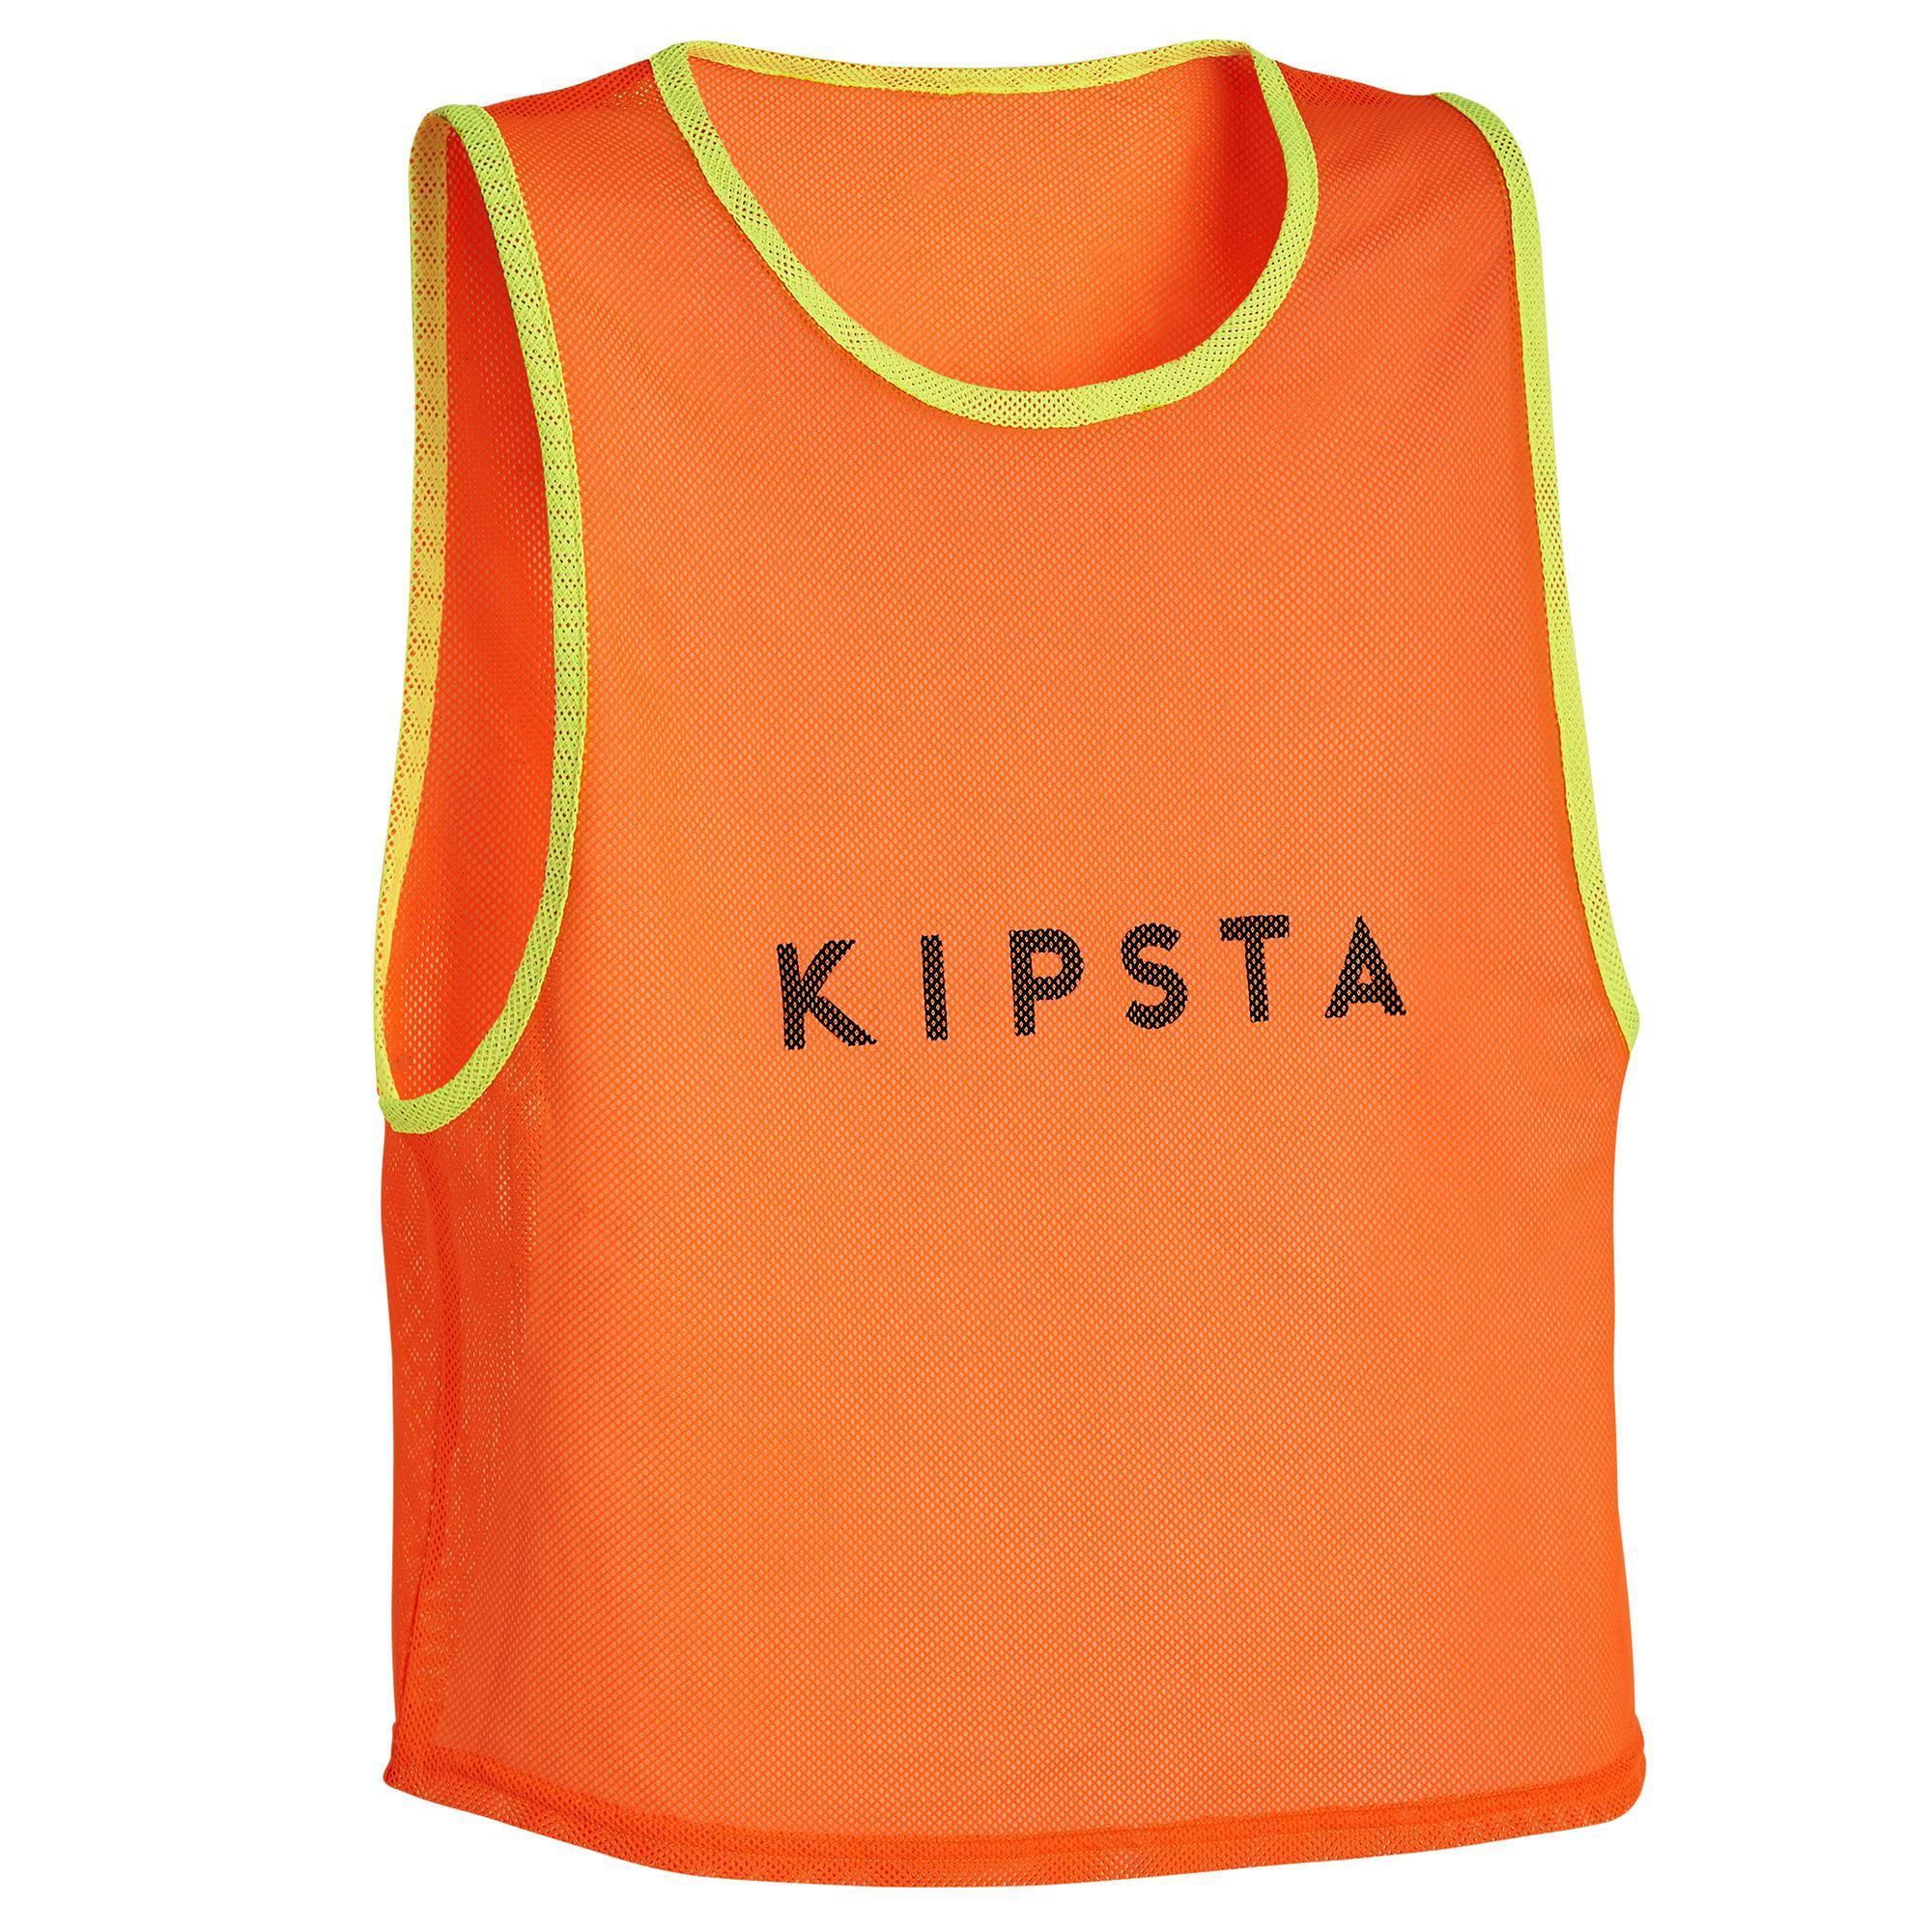 KIPSTA. Pettorina bambino arancione fluo